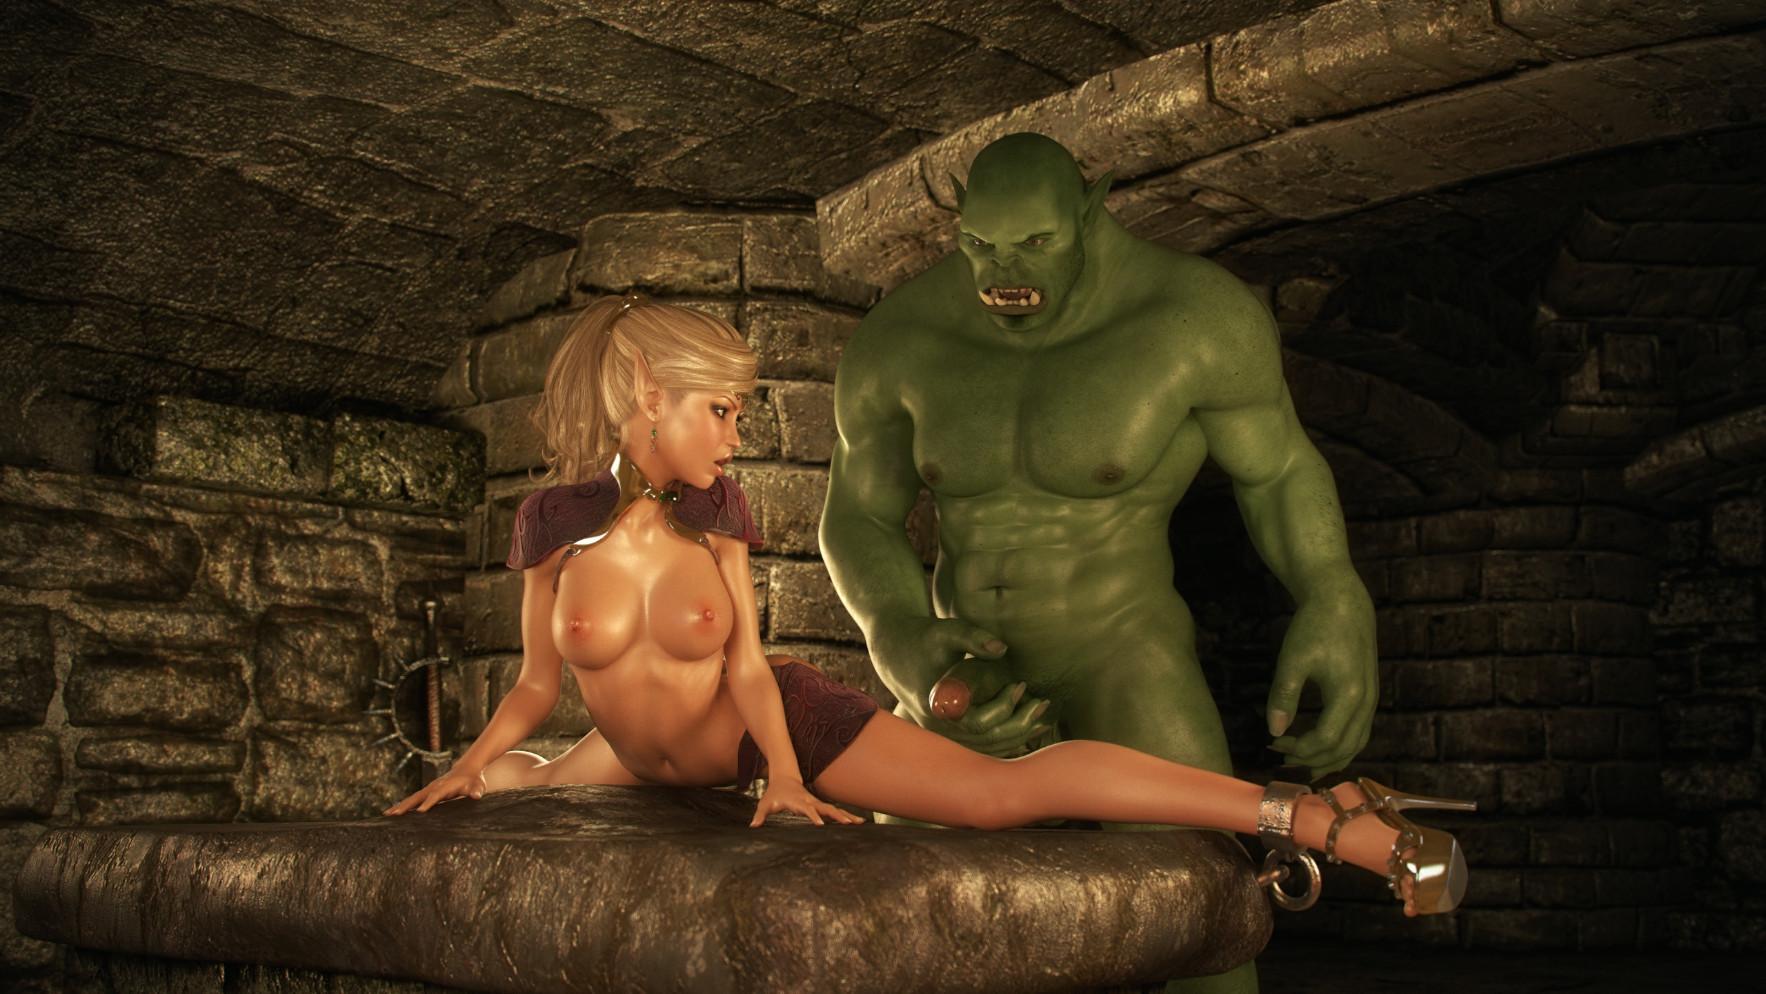 Секс фото тролли, тролль порно фото. Секс знакомства Meendo 15 фотография